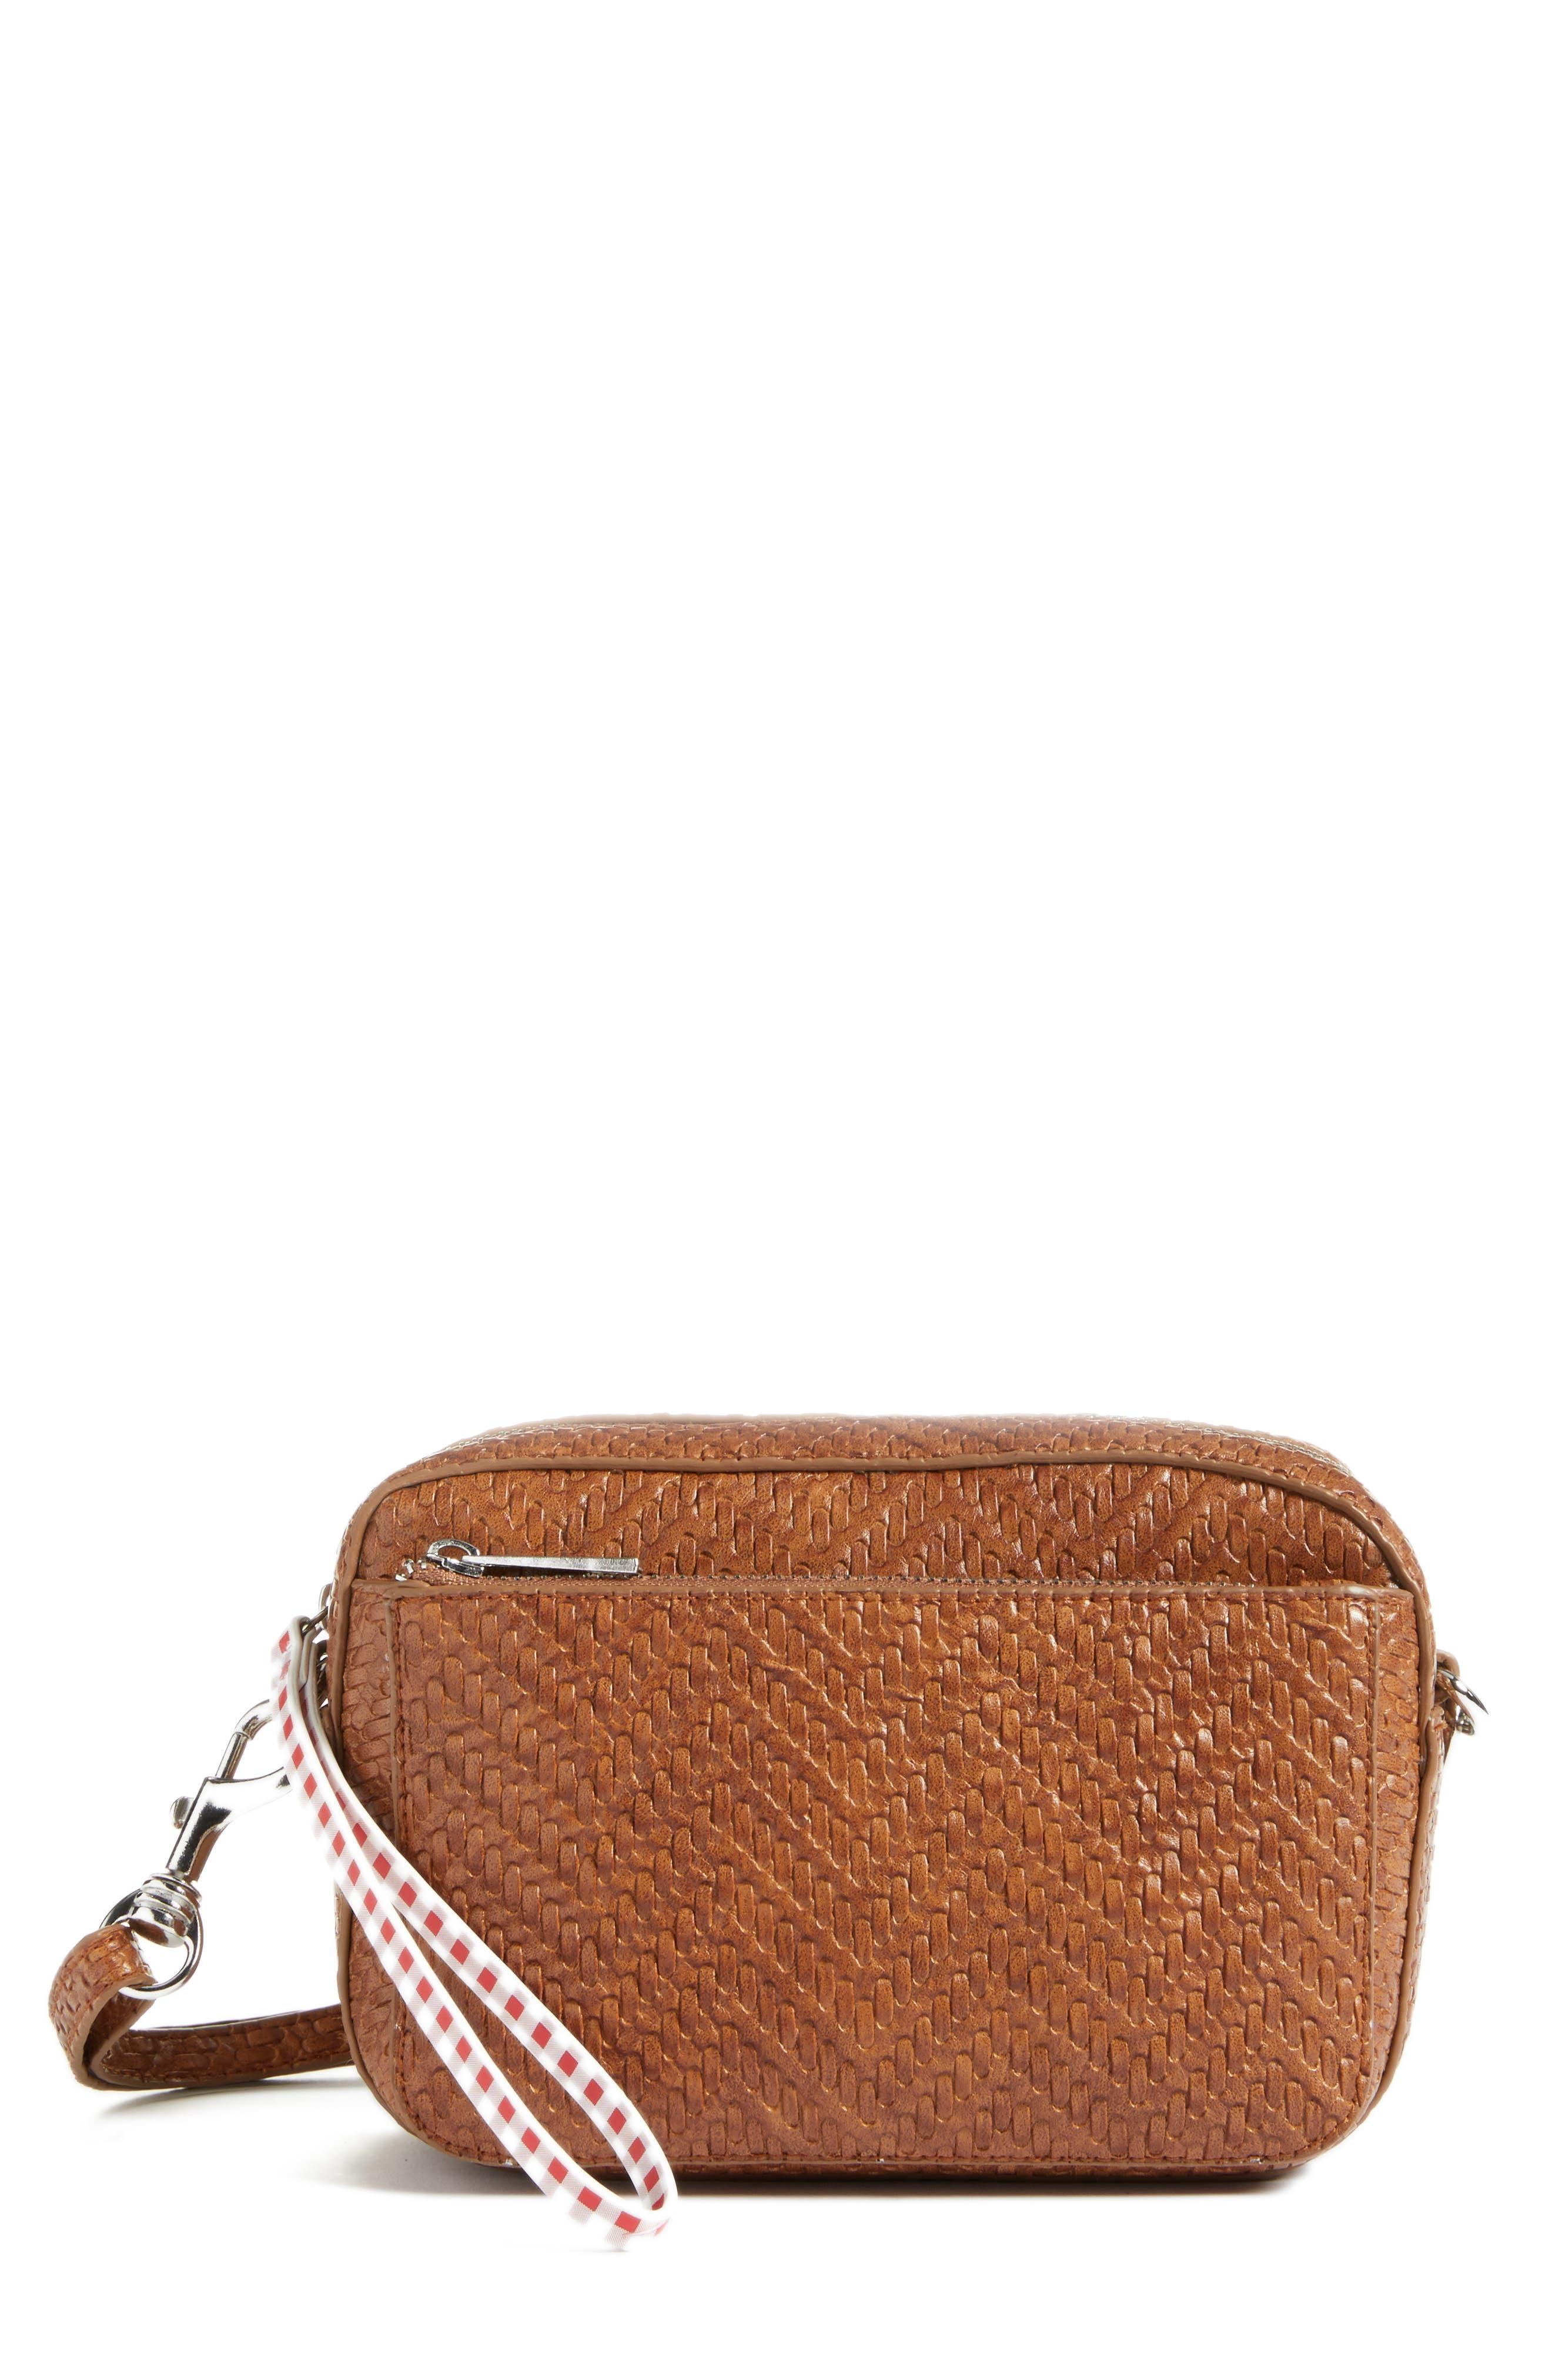 BP. Woven Crossbody Bag